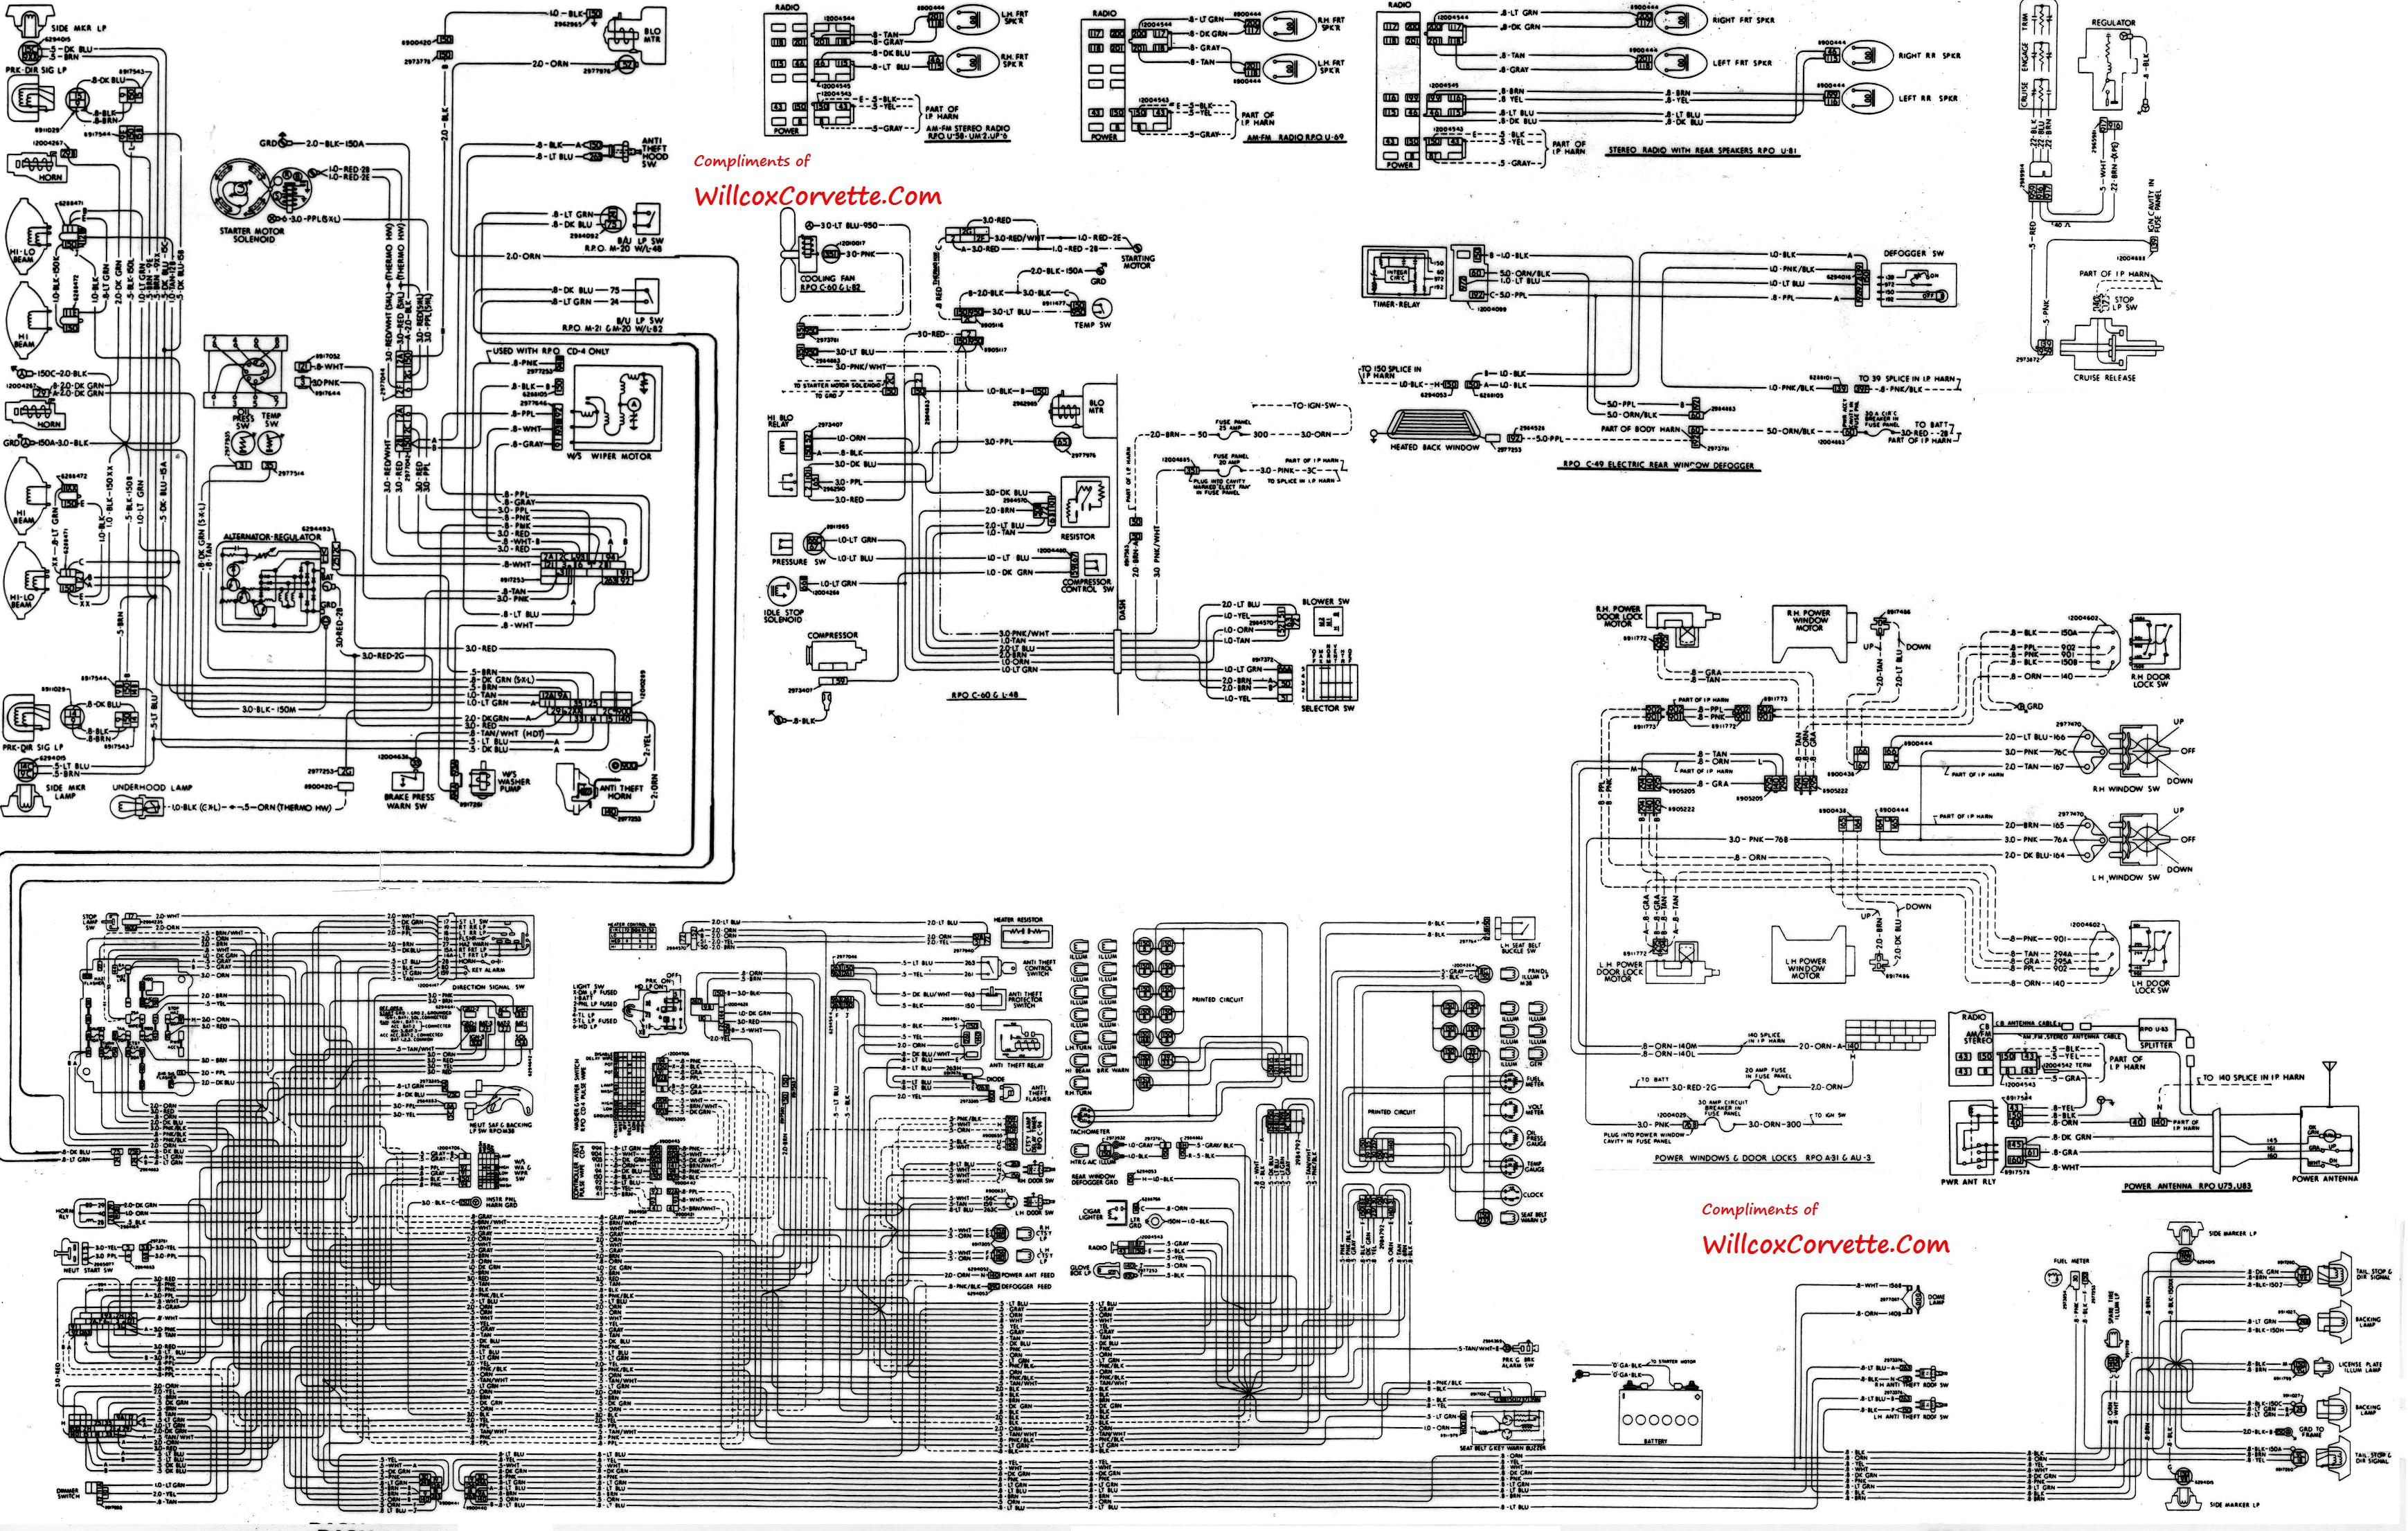 1982 Chevy Truck Wiring Diagram Corvette Wiring Diagram Wiring Diagram Of 1982 Chevy Truck Wiring Diagram